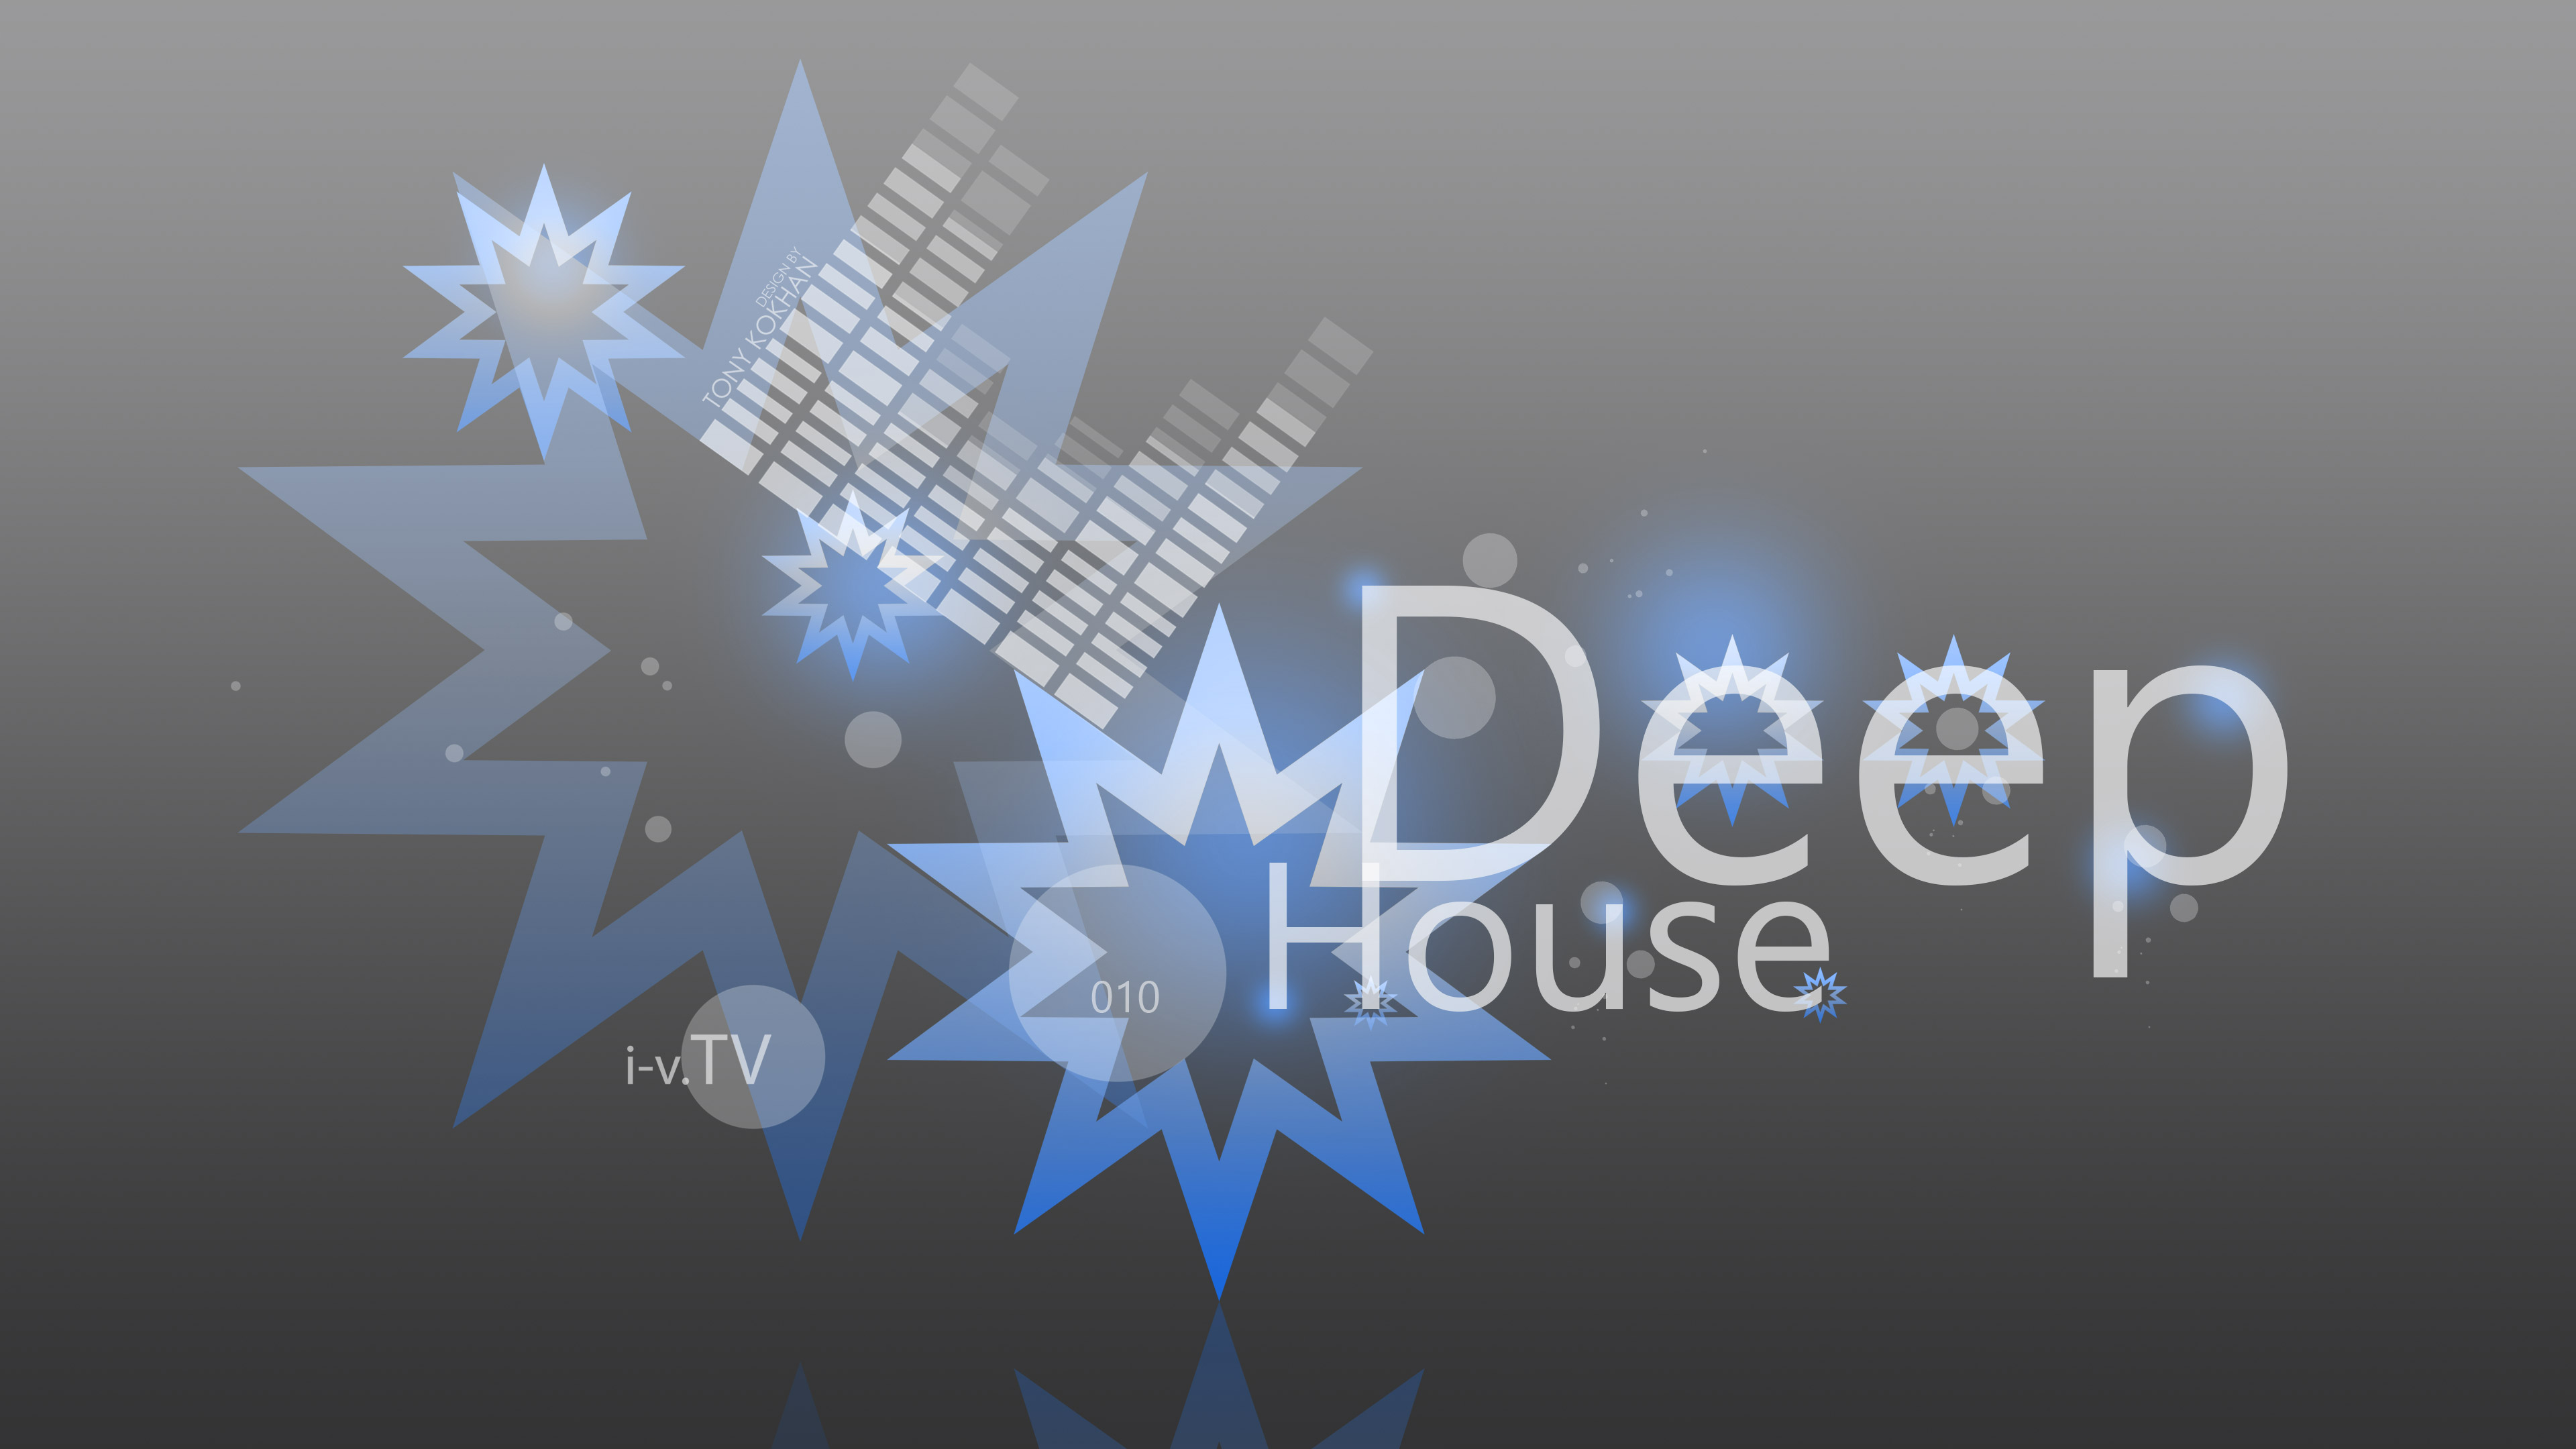 Deep House Music eQ Simple Creative Ten Abstract Words 3840x2160